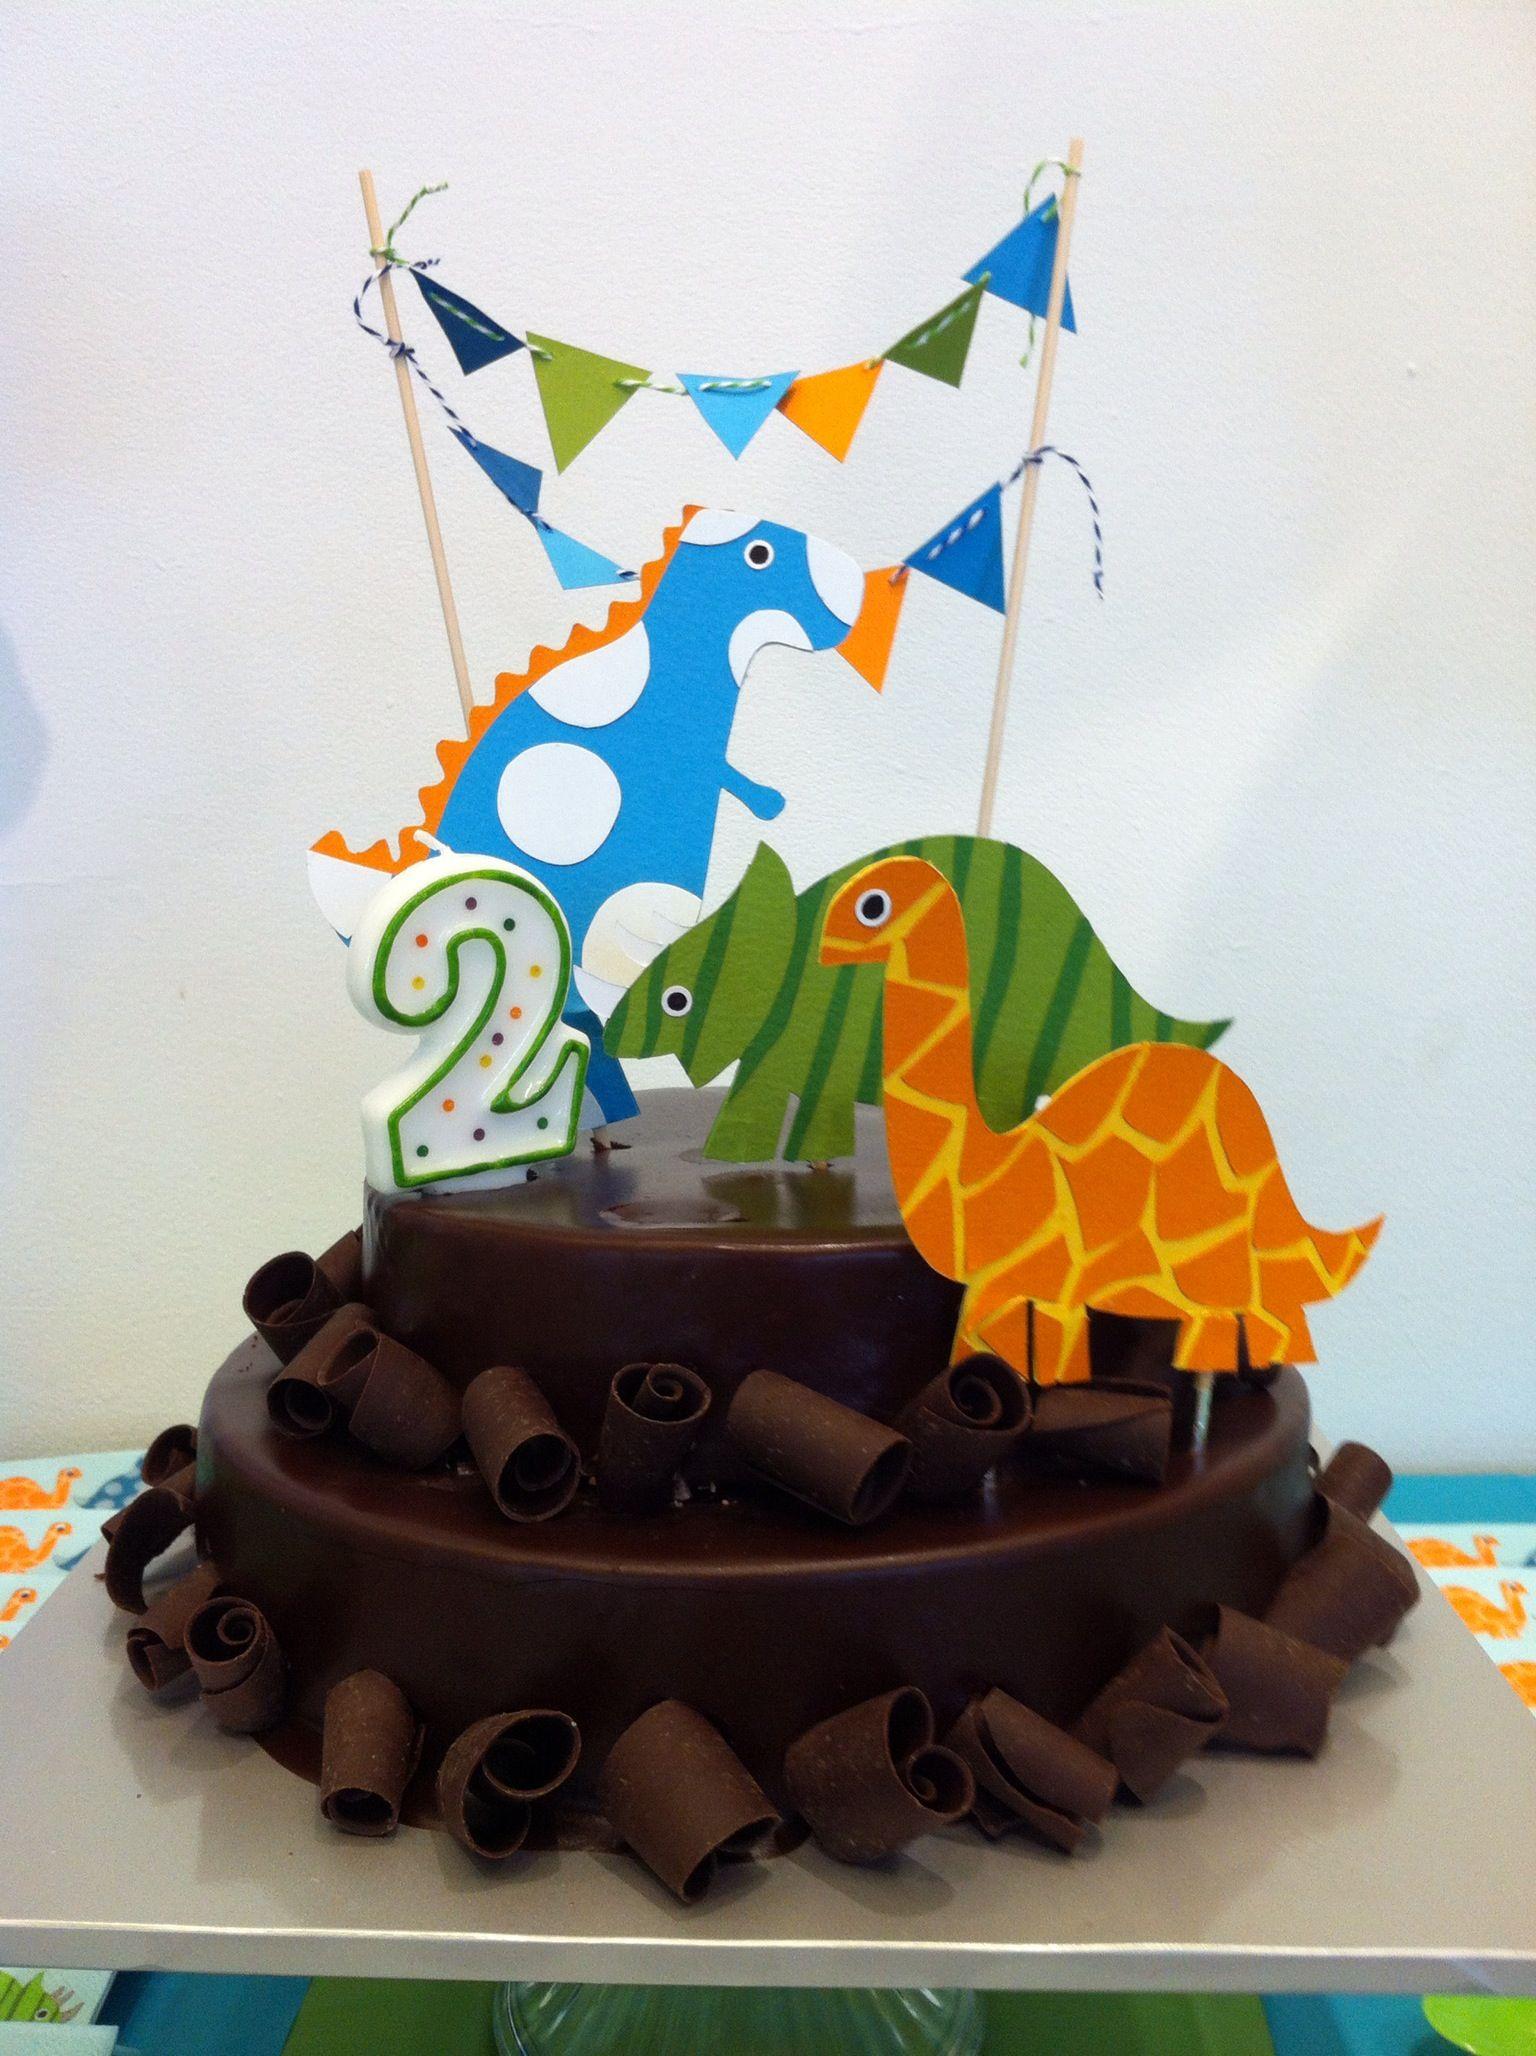 Paper Cake Decorations